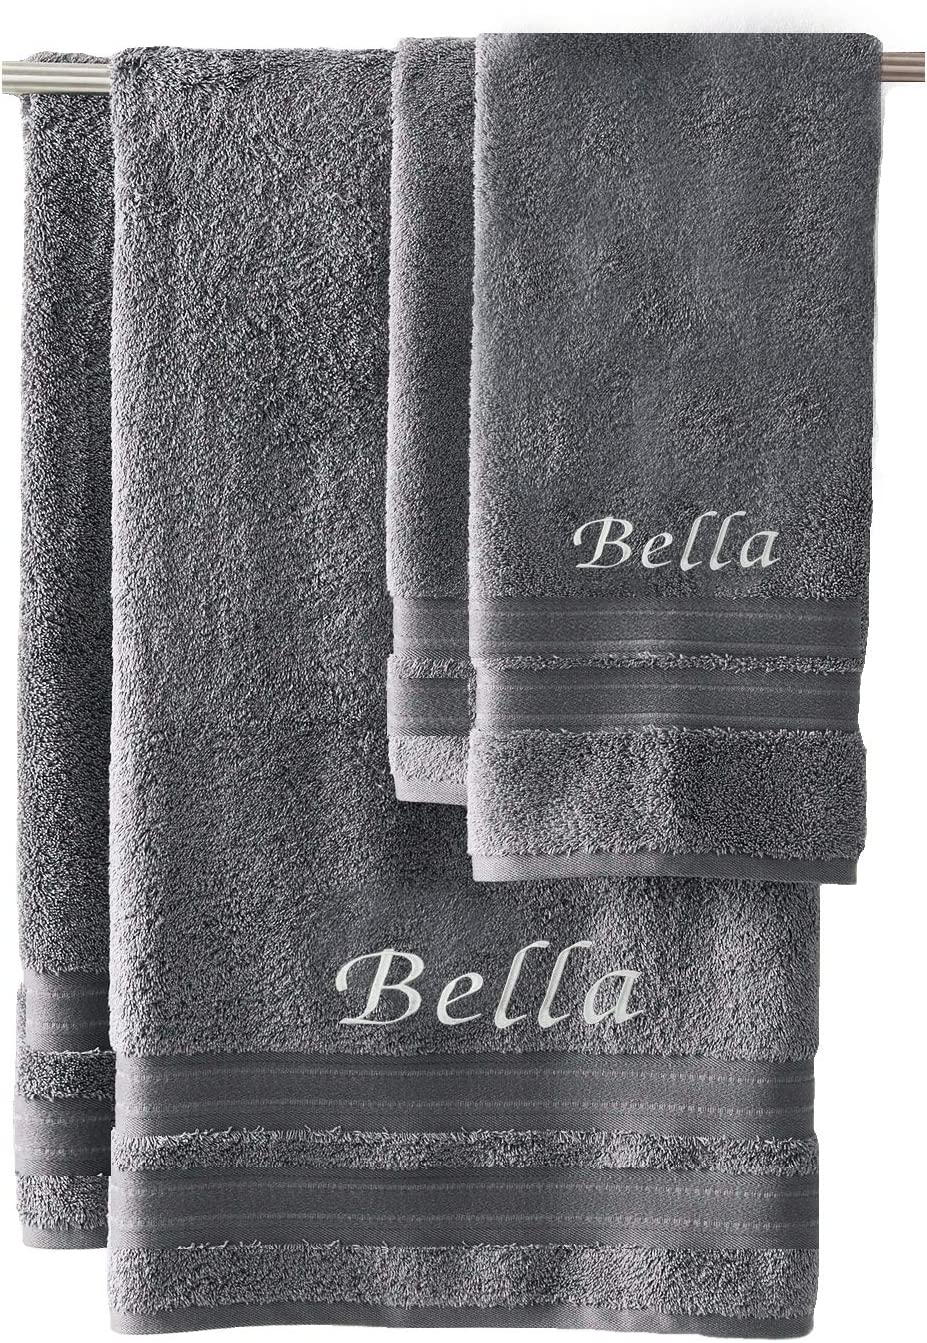 Star Trek Designs Embroidered Personalised Cotton Bath Towel